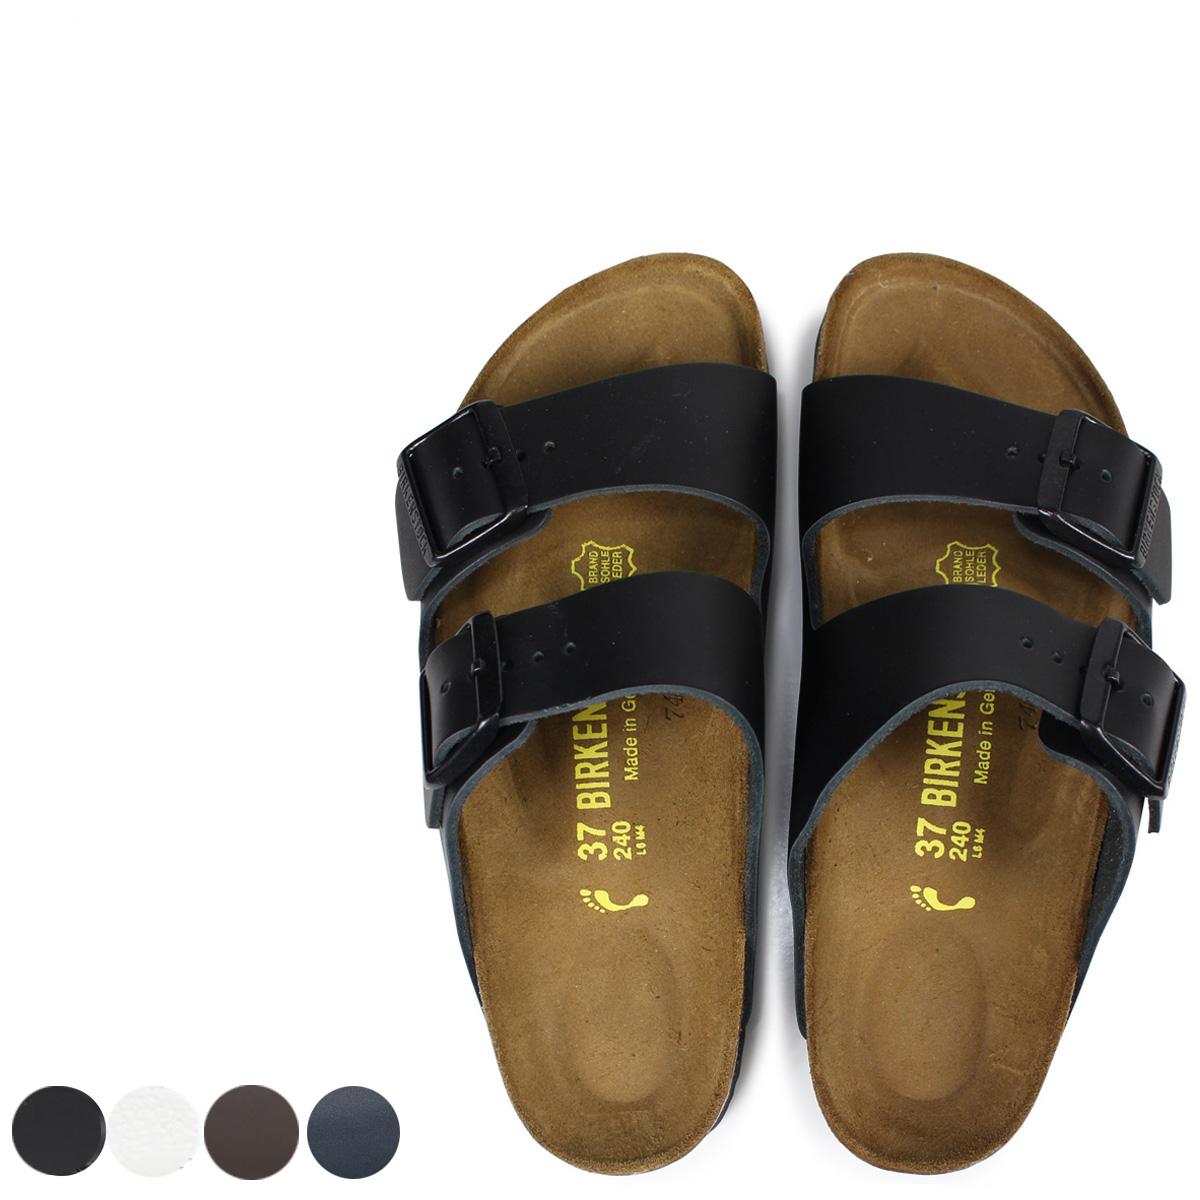 59ff0aab48d2 ALLSPORTS   SOLD OUT  BIRKENSTOCK-Birkenstock Arizona vilken Sandals  usually wide ARIZONA NL mens